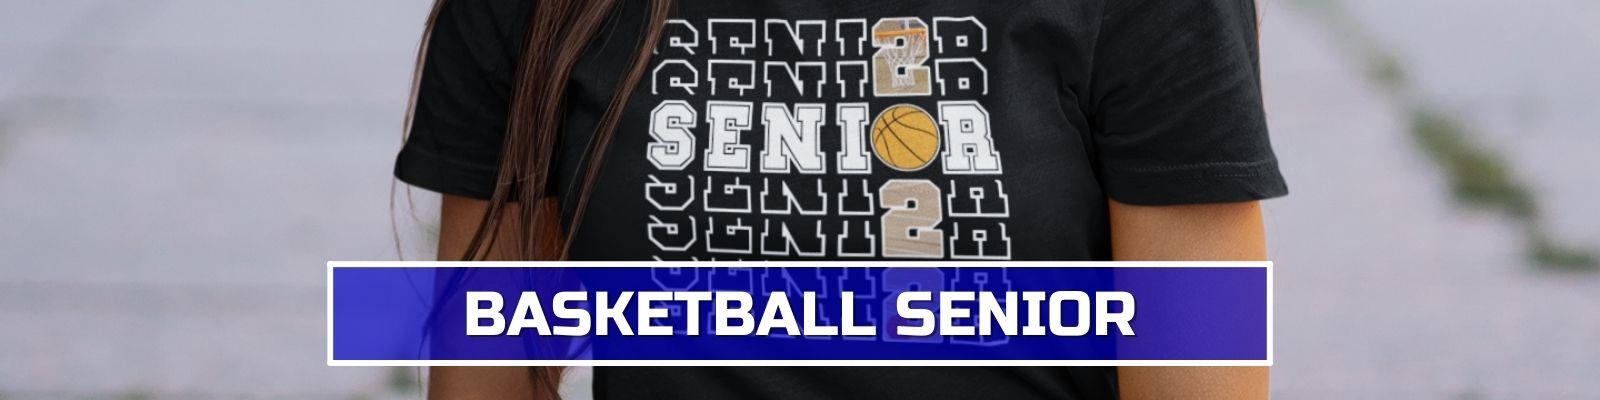 basketball-senior-night